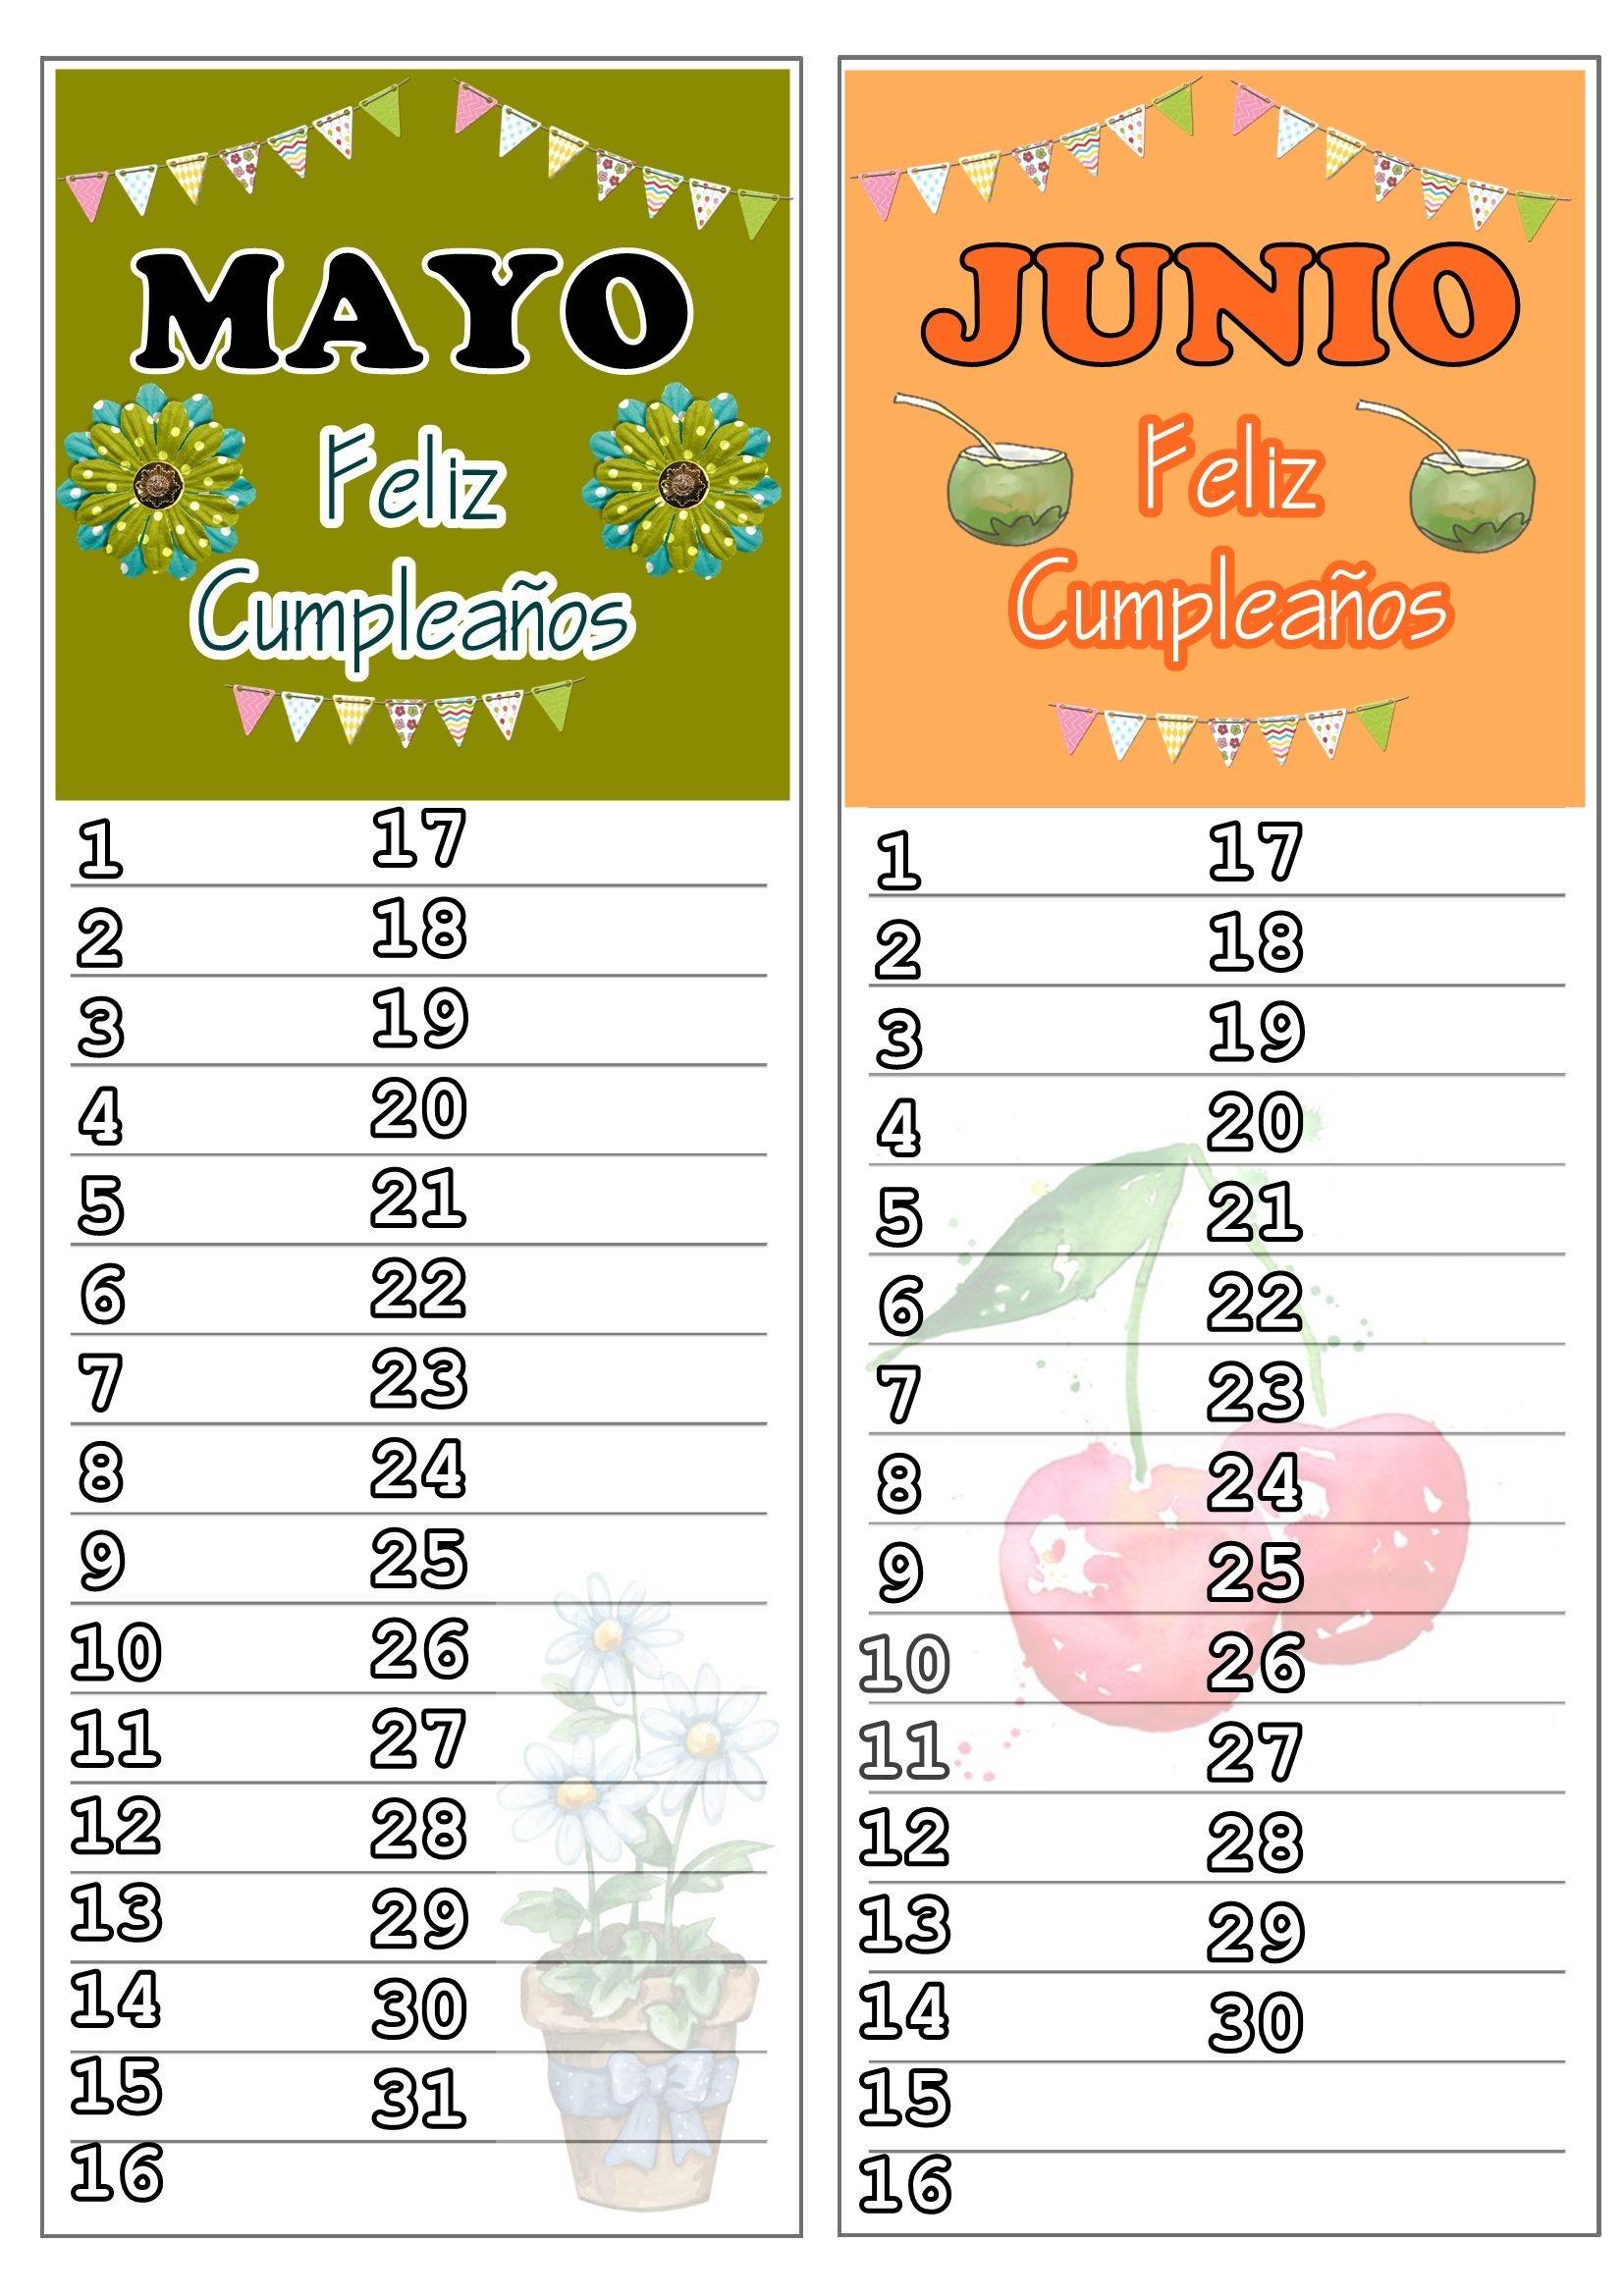 Mayo Junio 2015 Feliz Cumplea±os Happy Birthday Classroom Organization